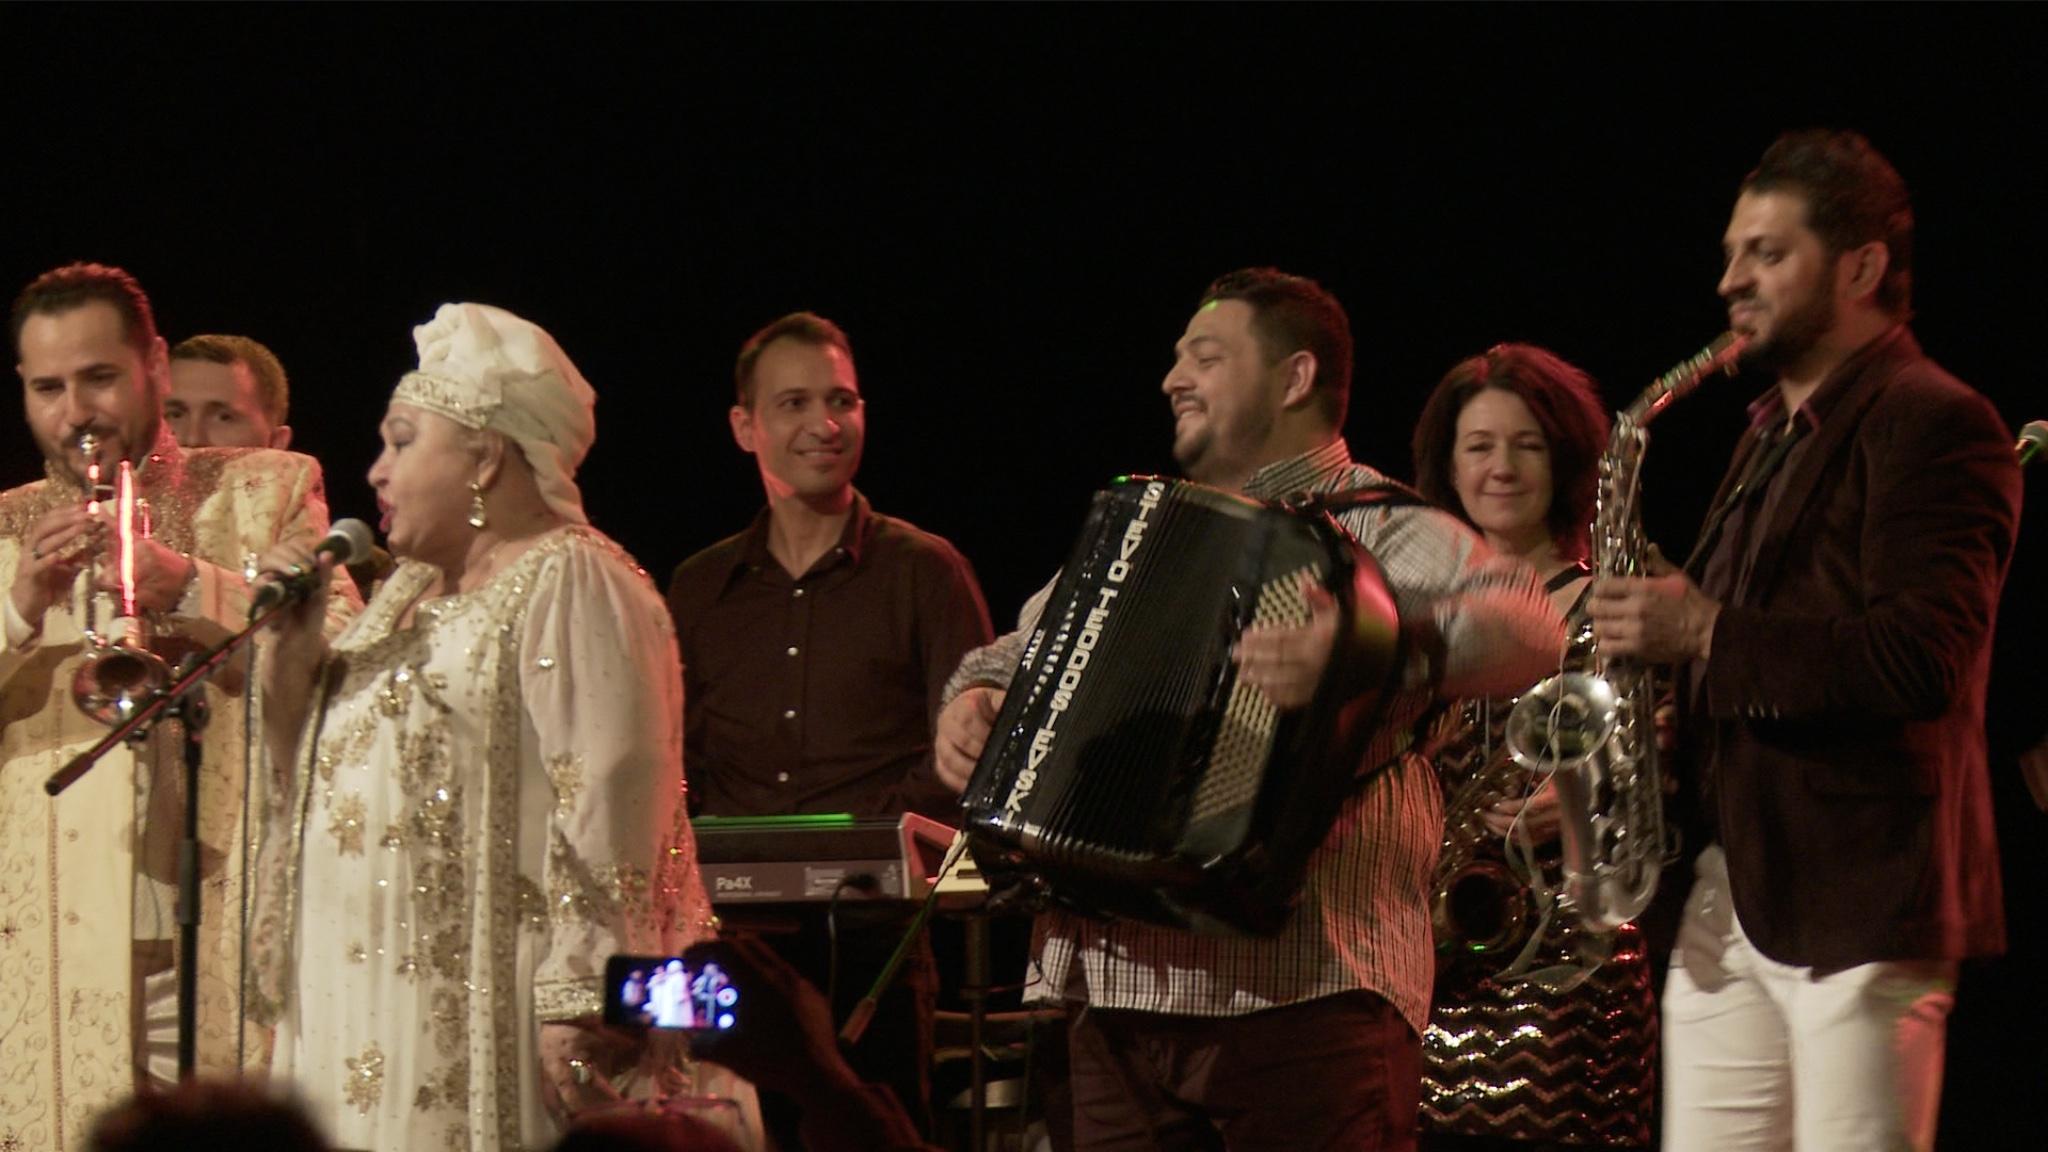 Simeon Atanasov 6 Gypsyfestival Esma Redzepova Ssassa